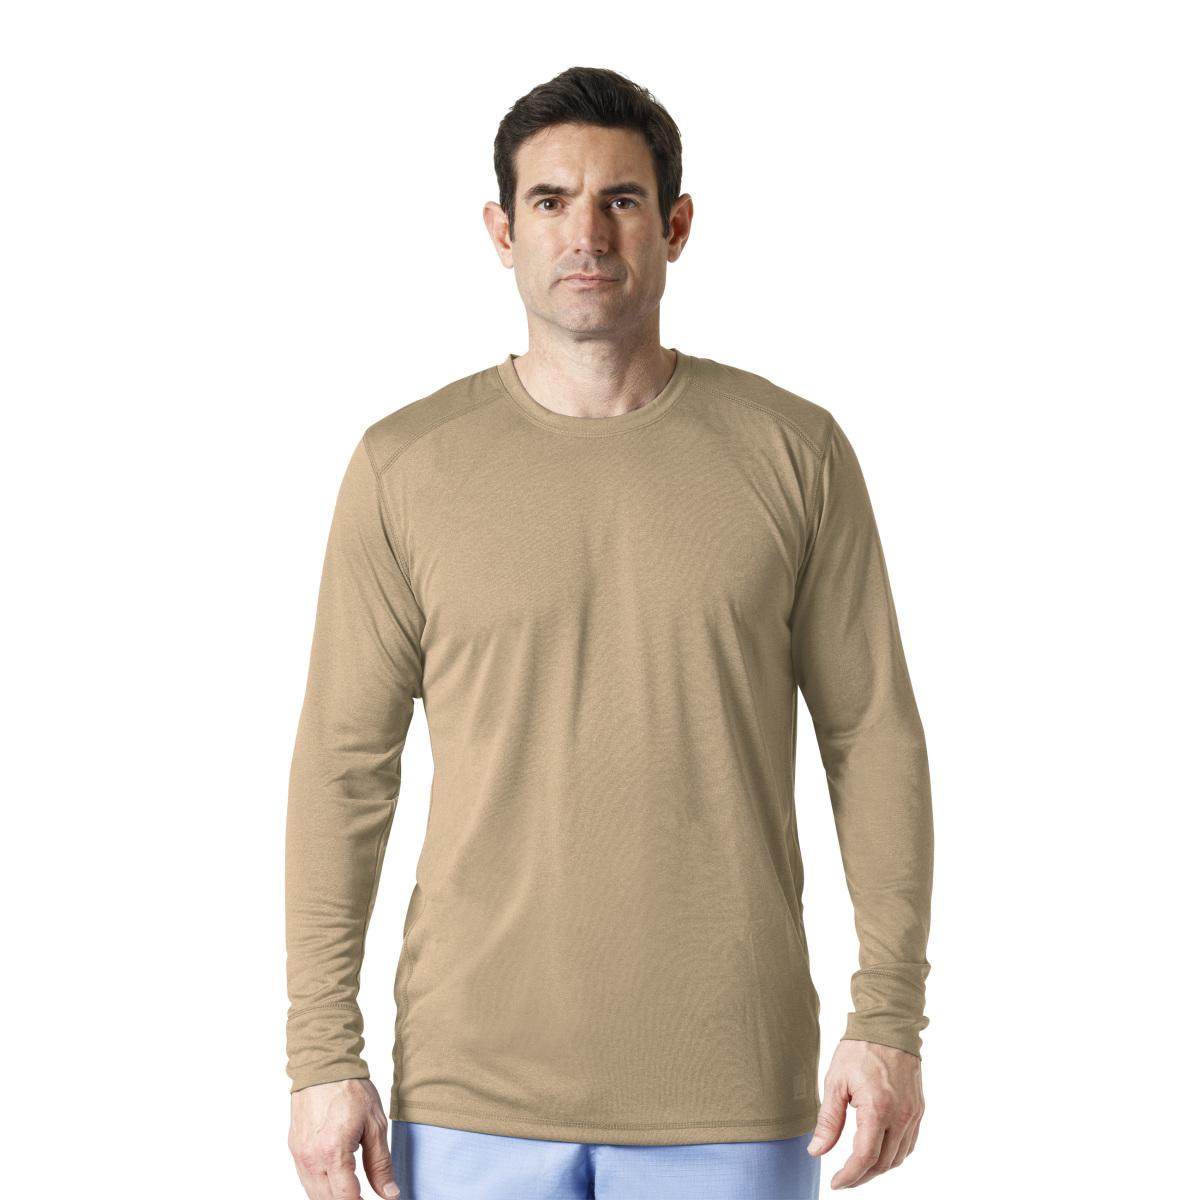 DEAL - Carhartt FORCE Men's Long Sleeve Tee - C36109-